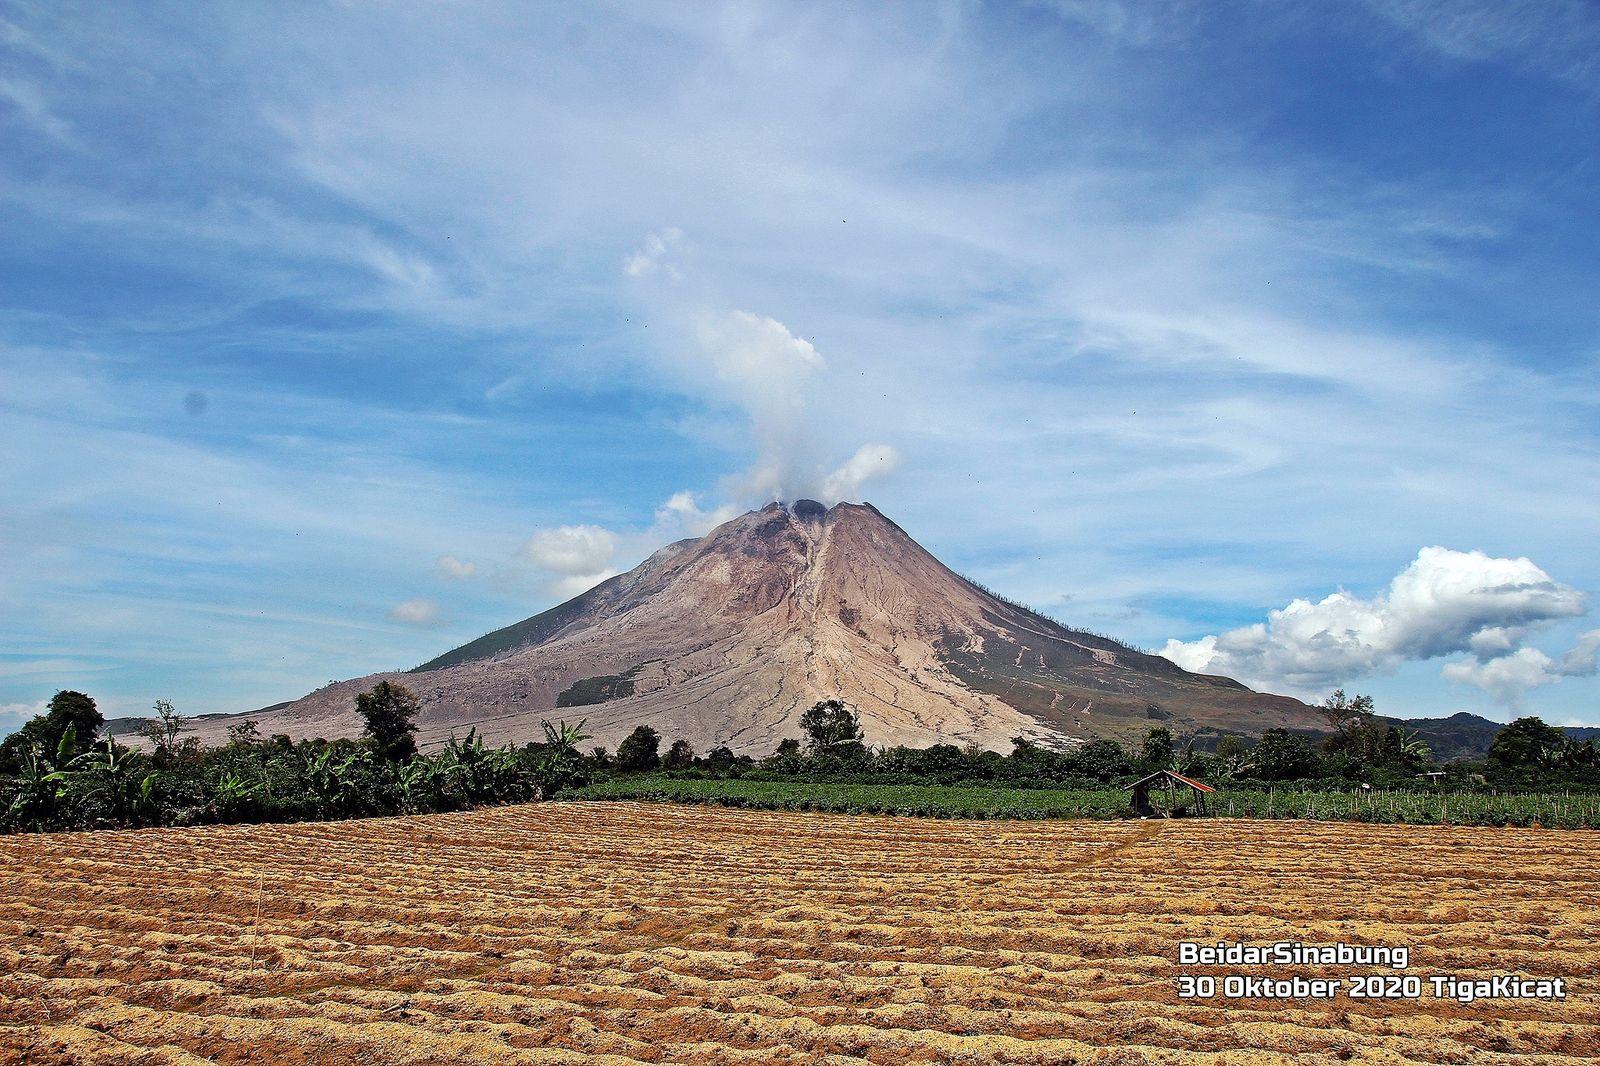 Sinabung - le volcan, bien visible, émet un léger panache blanc - photo 30.10.2020  Firdaus Surbakti / Beidar Sinabung